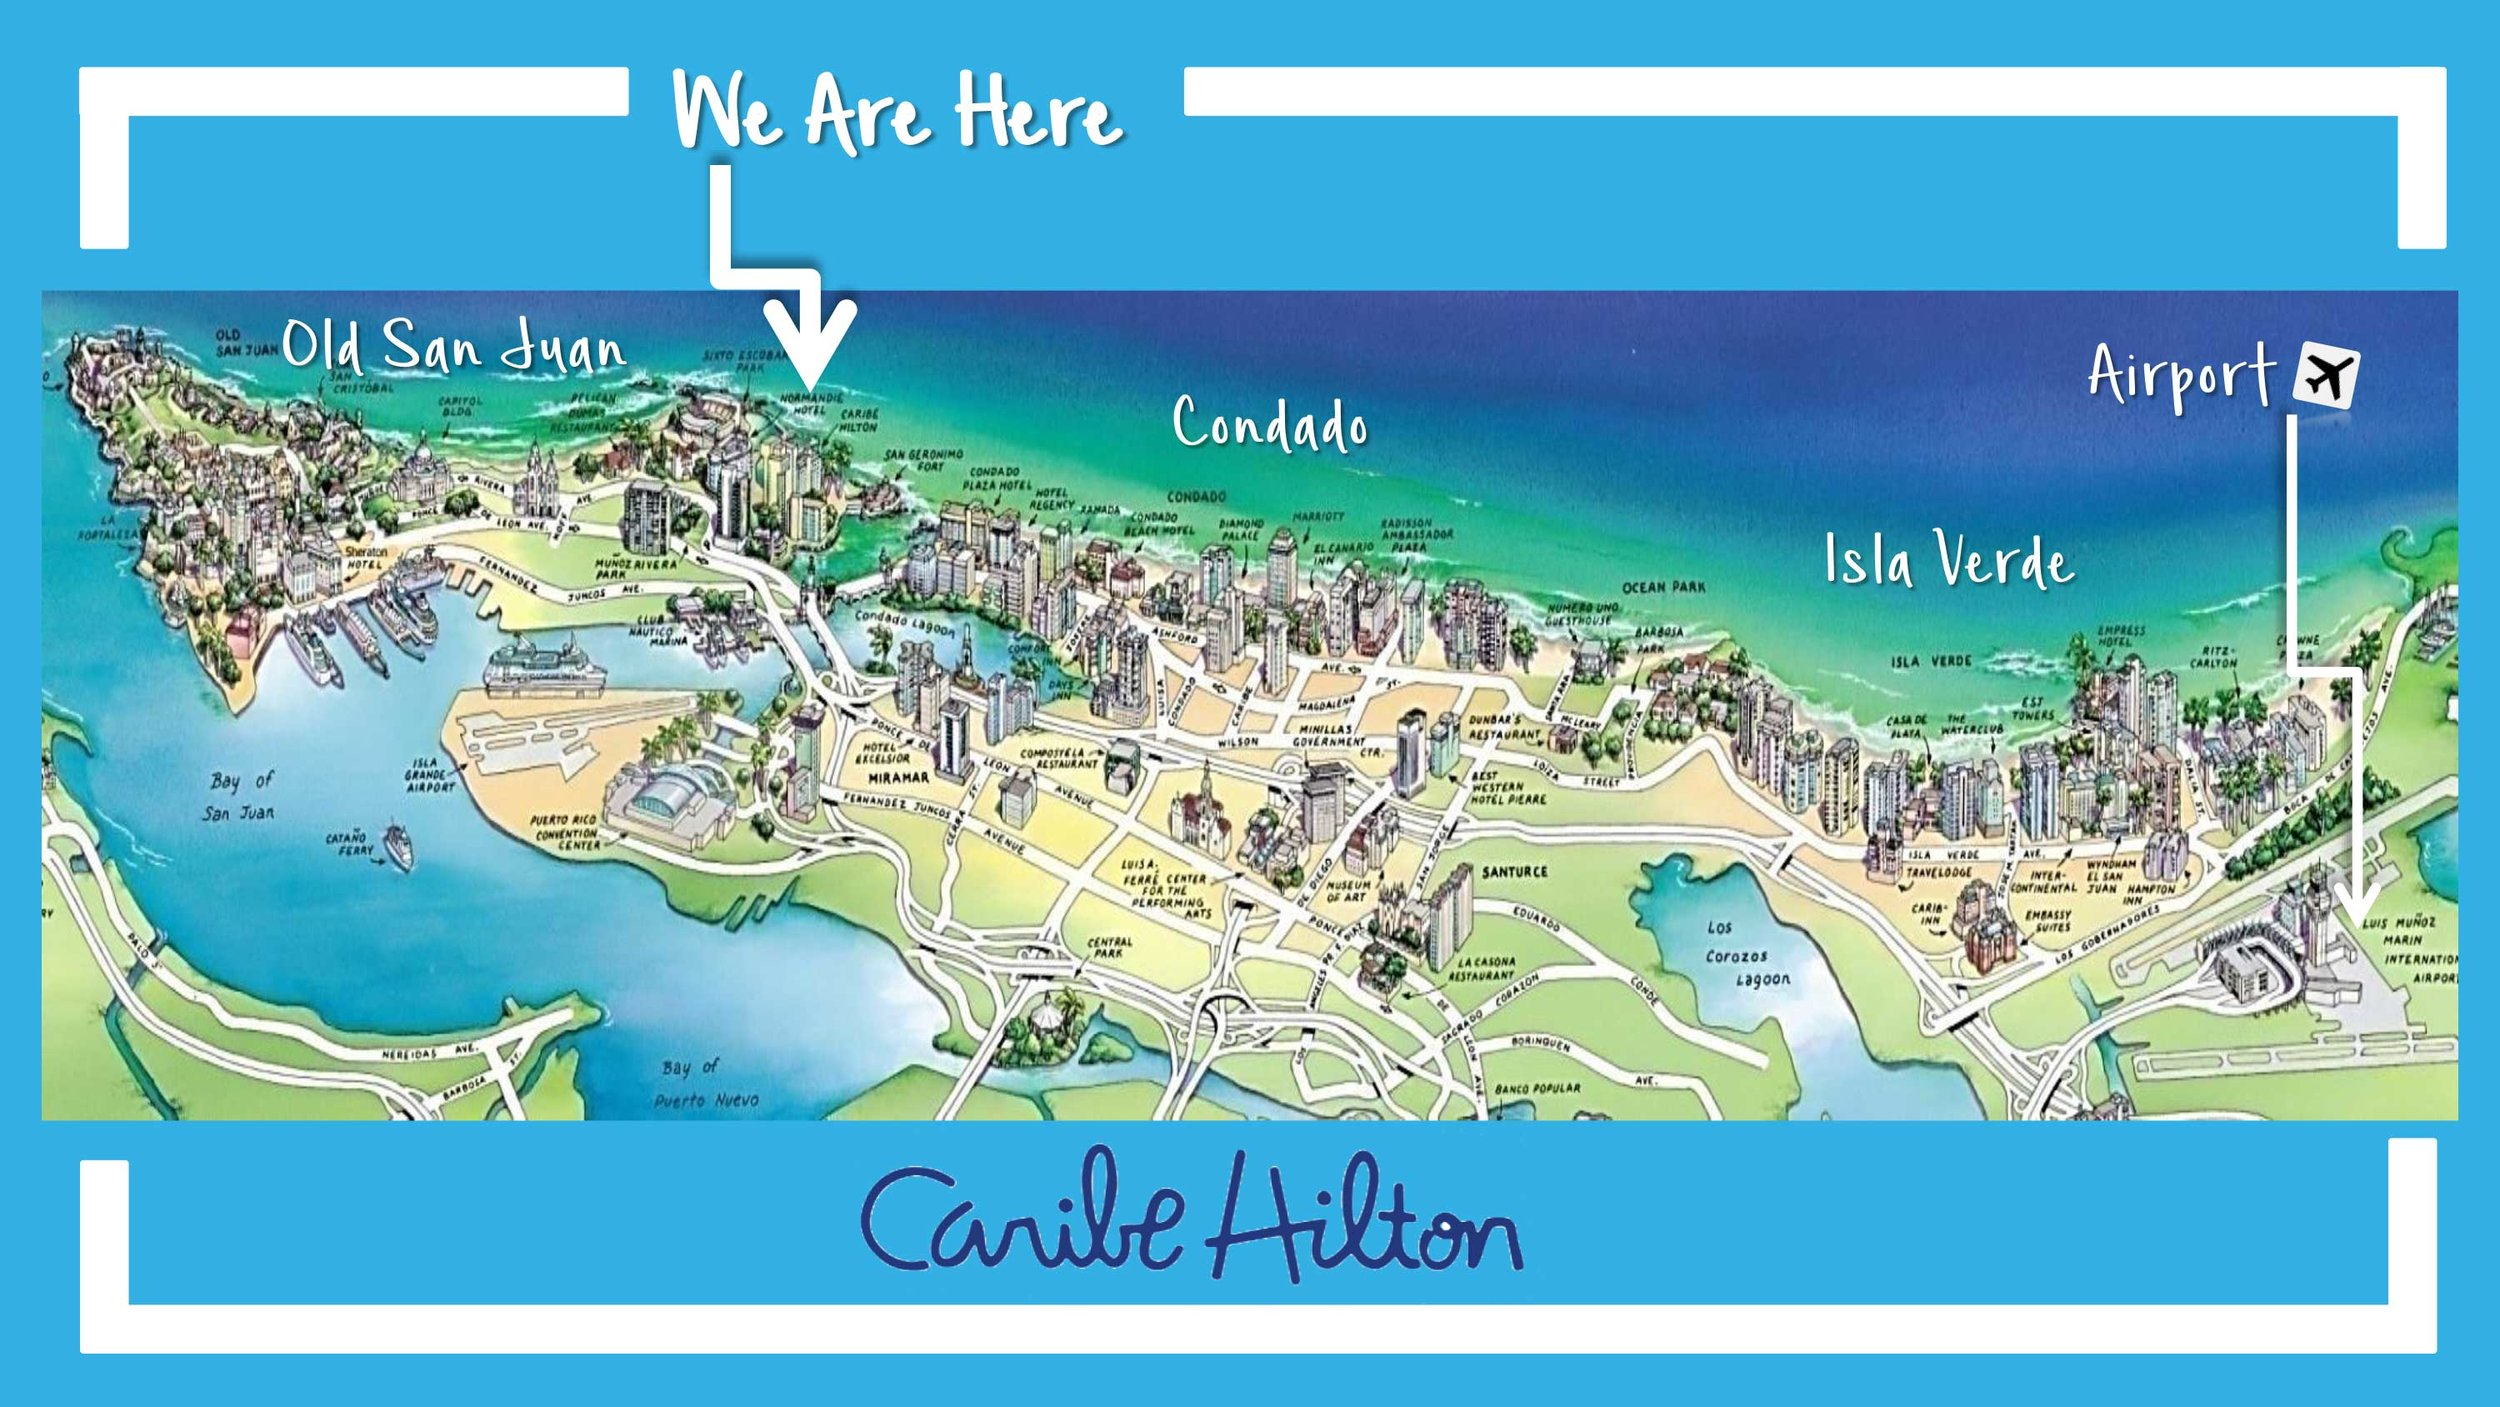 Caribe-Hilton-Map.jpg